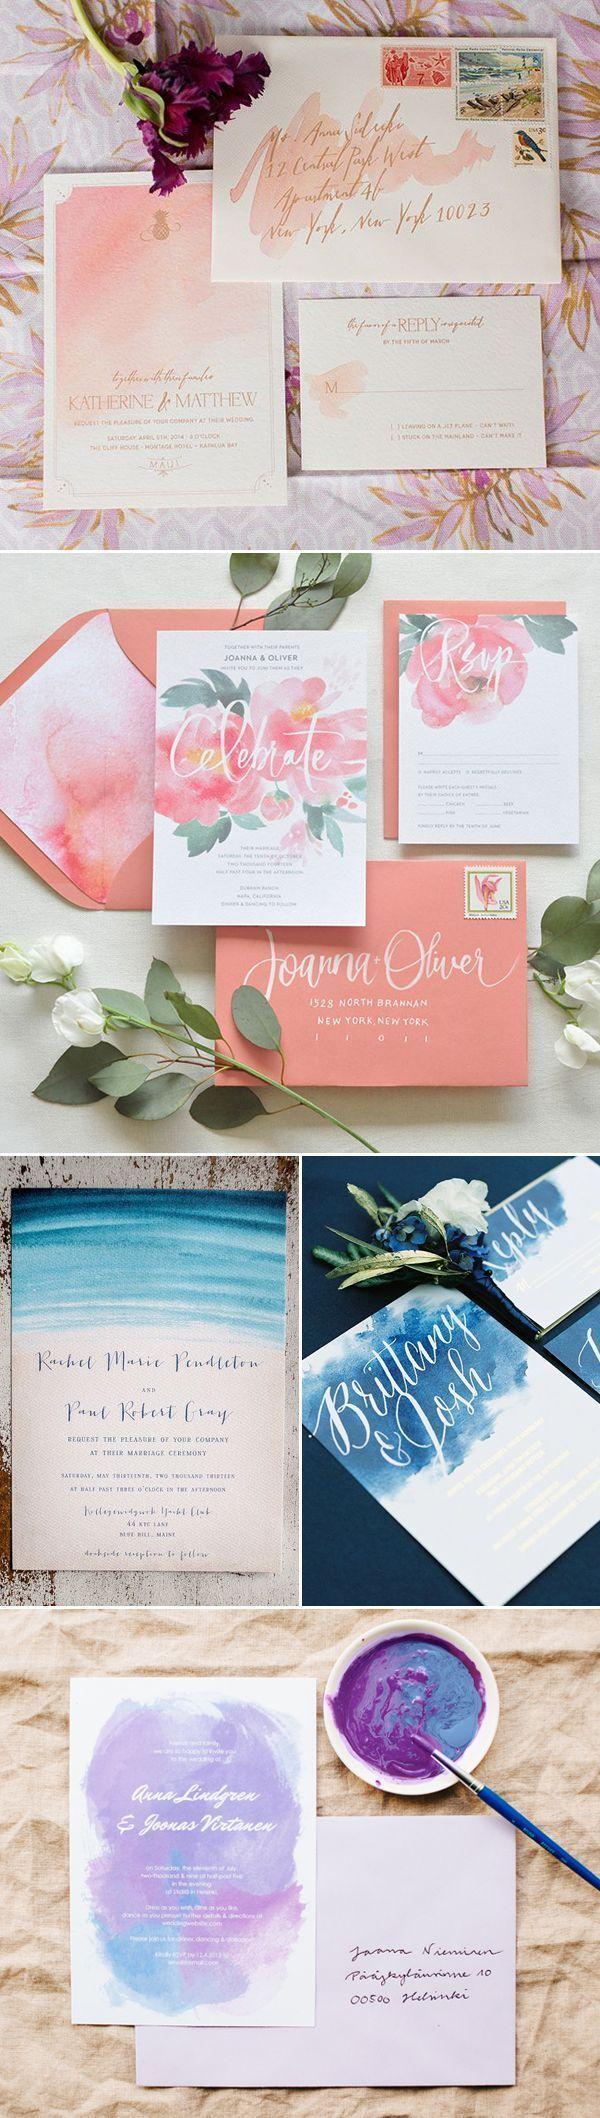 cinderellthemed wedding scroll invitations%0A    Creative Invitation Ideas for Minimalist Couples